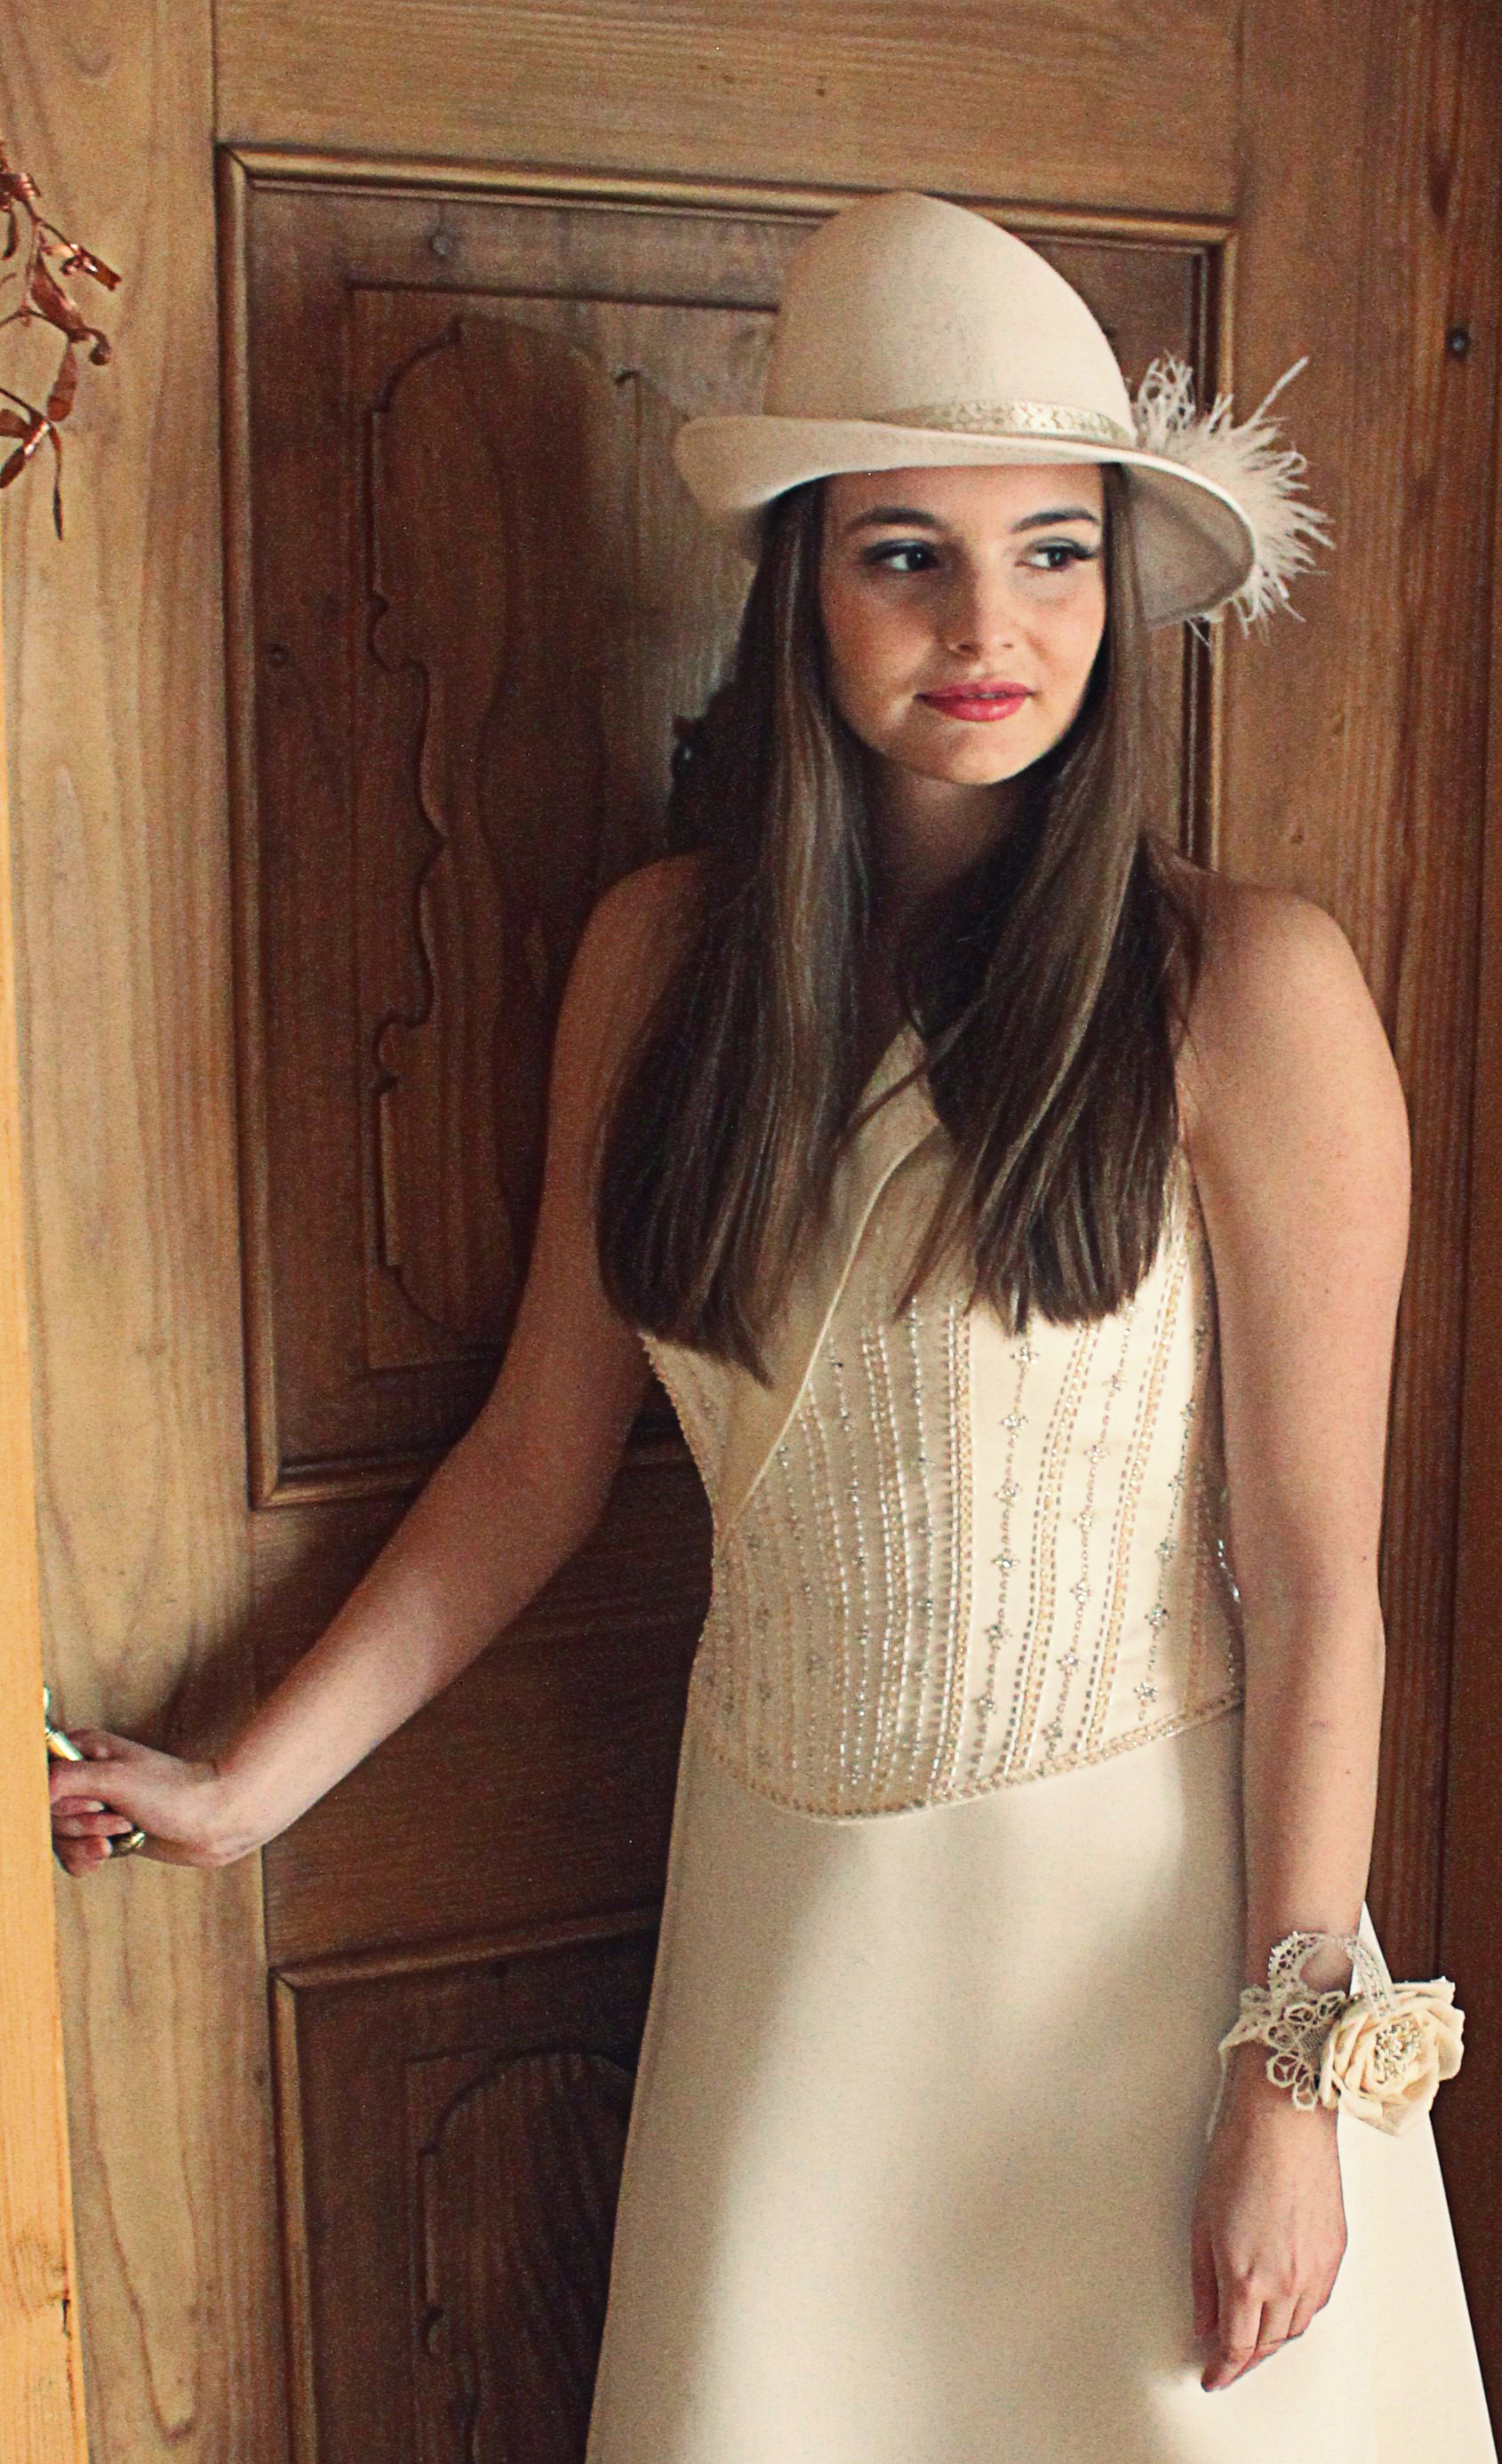 Braut mit elegantem Hut